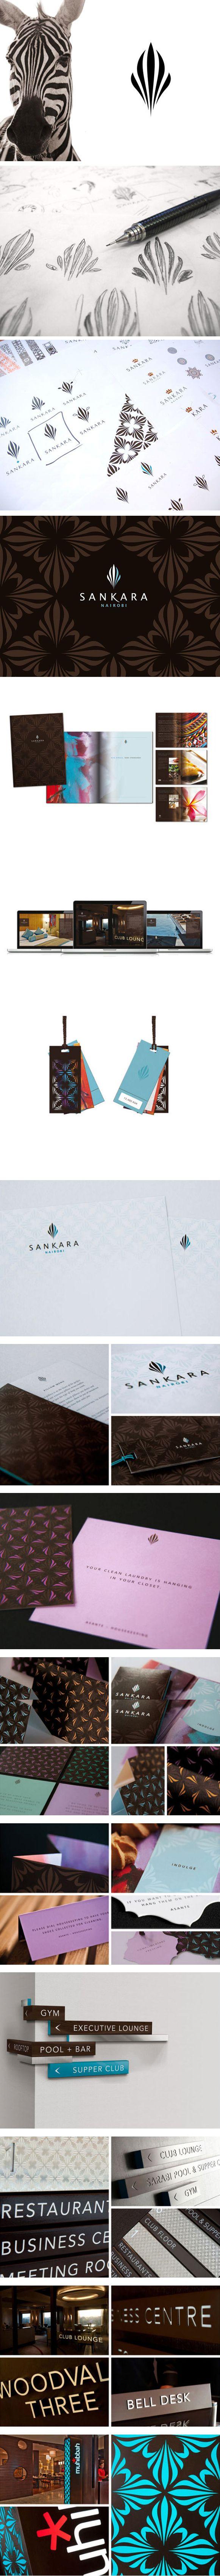 Sankara 酒店形象设计